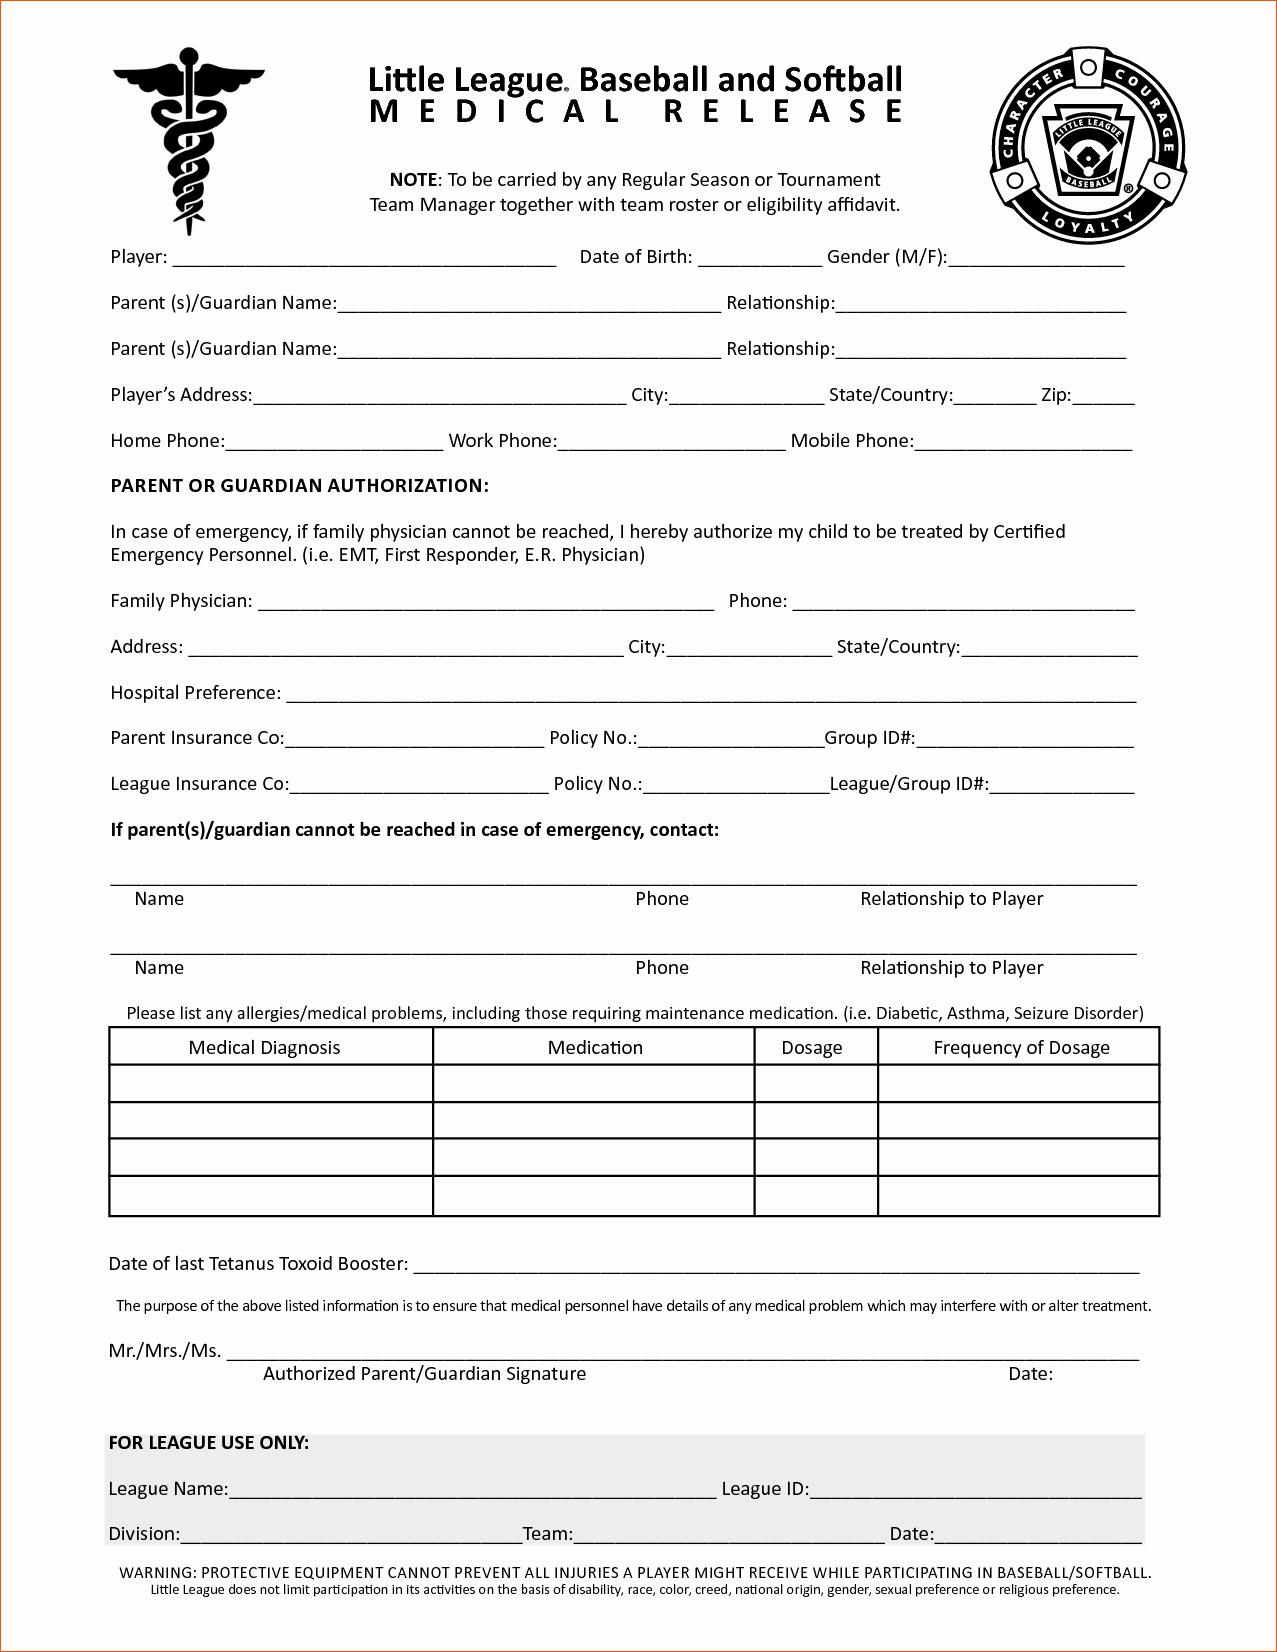 Free Printable Medical forms Elegant Blank Medical forms Mughals